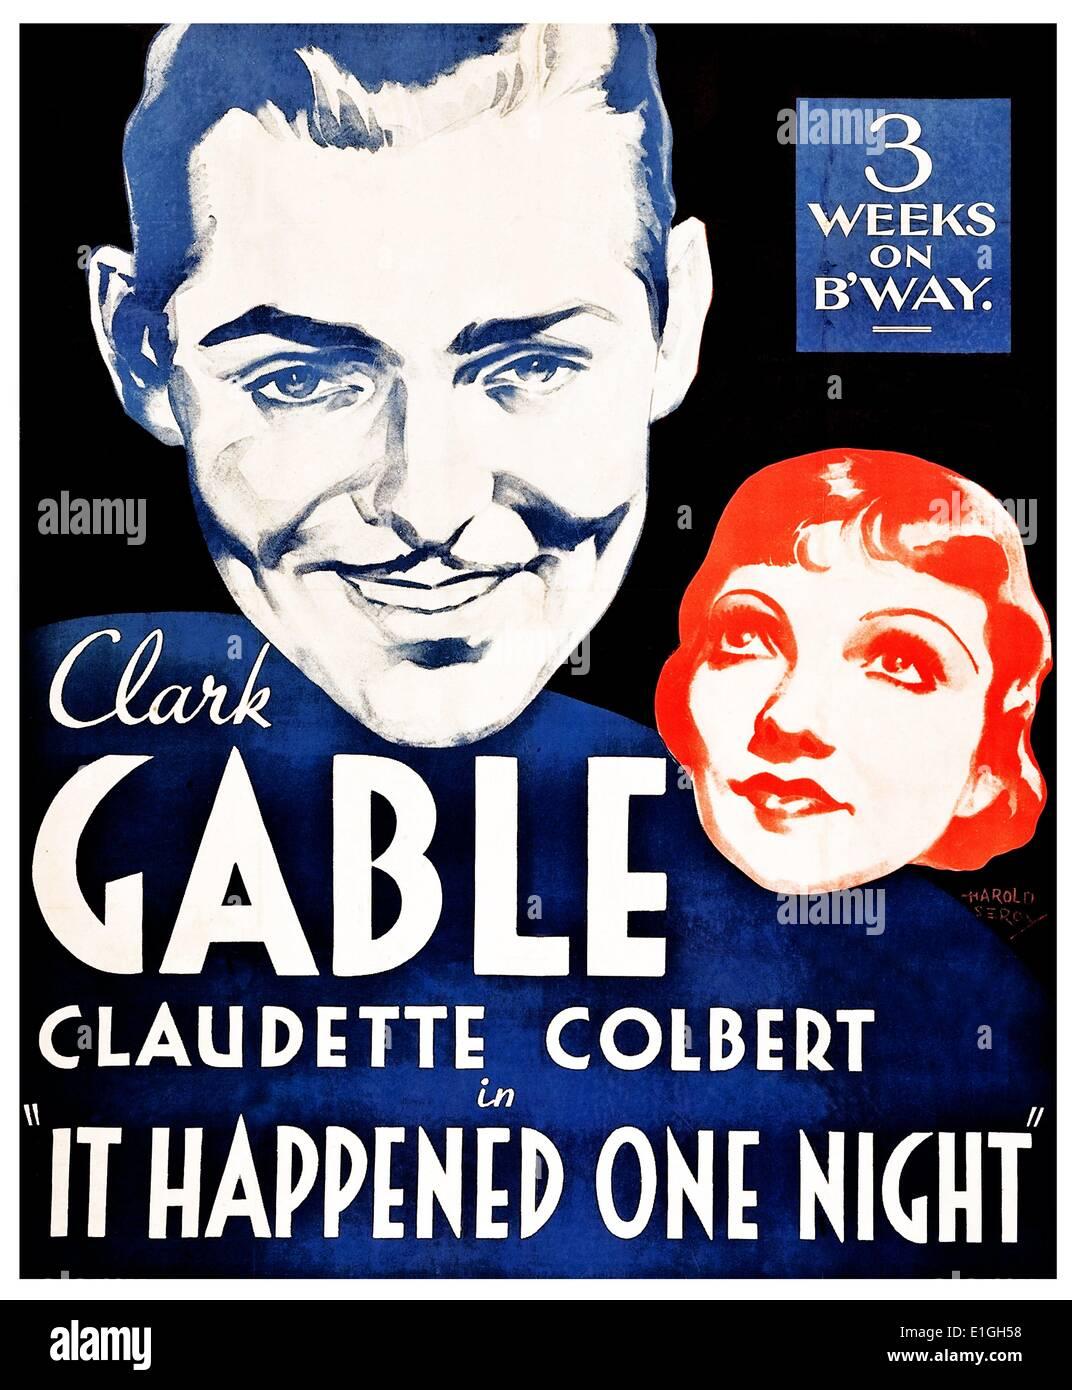 'It Happened One Night' starring Clark Gable and Claudette Colbert. Winner of all 5 major 1934 Oscars. - Stock Image